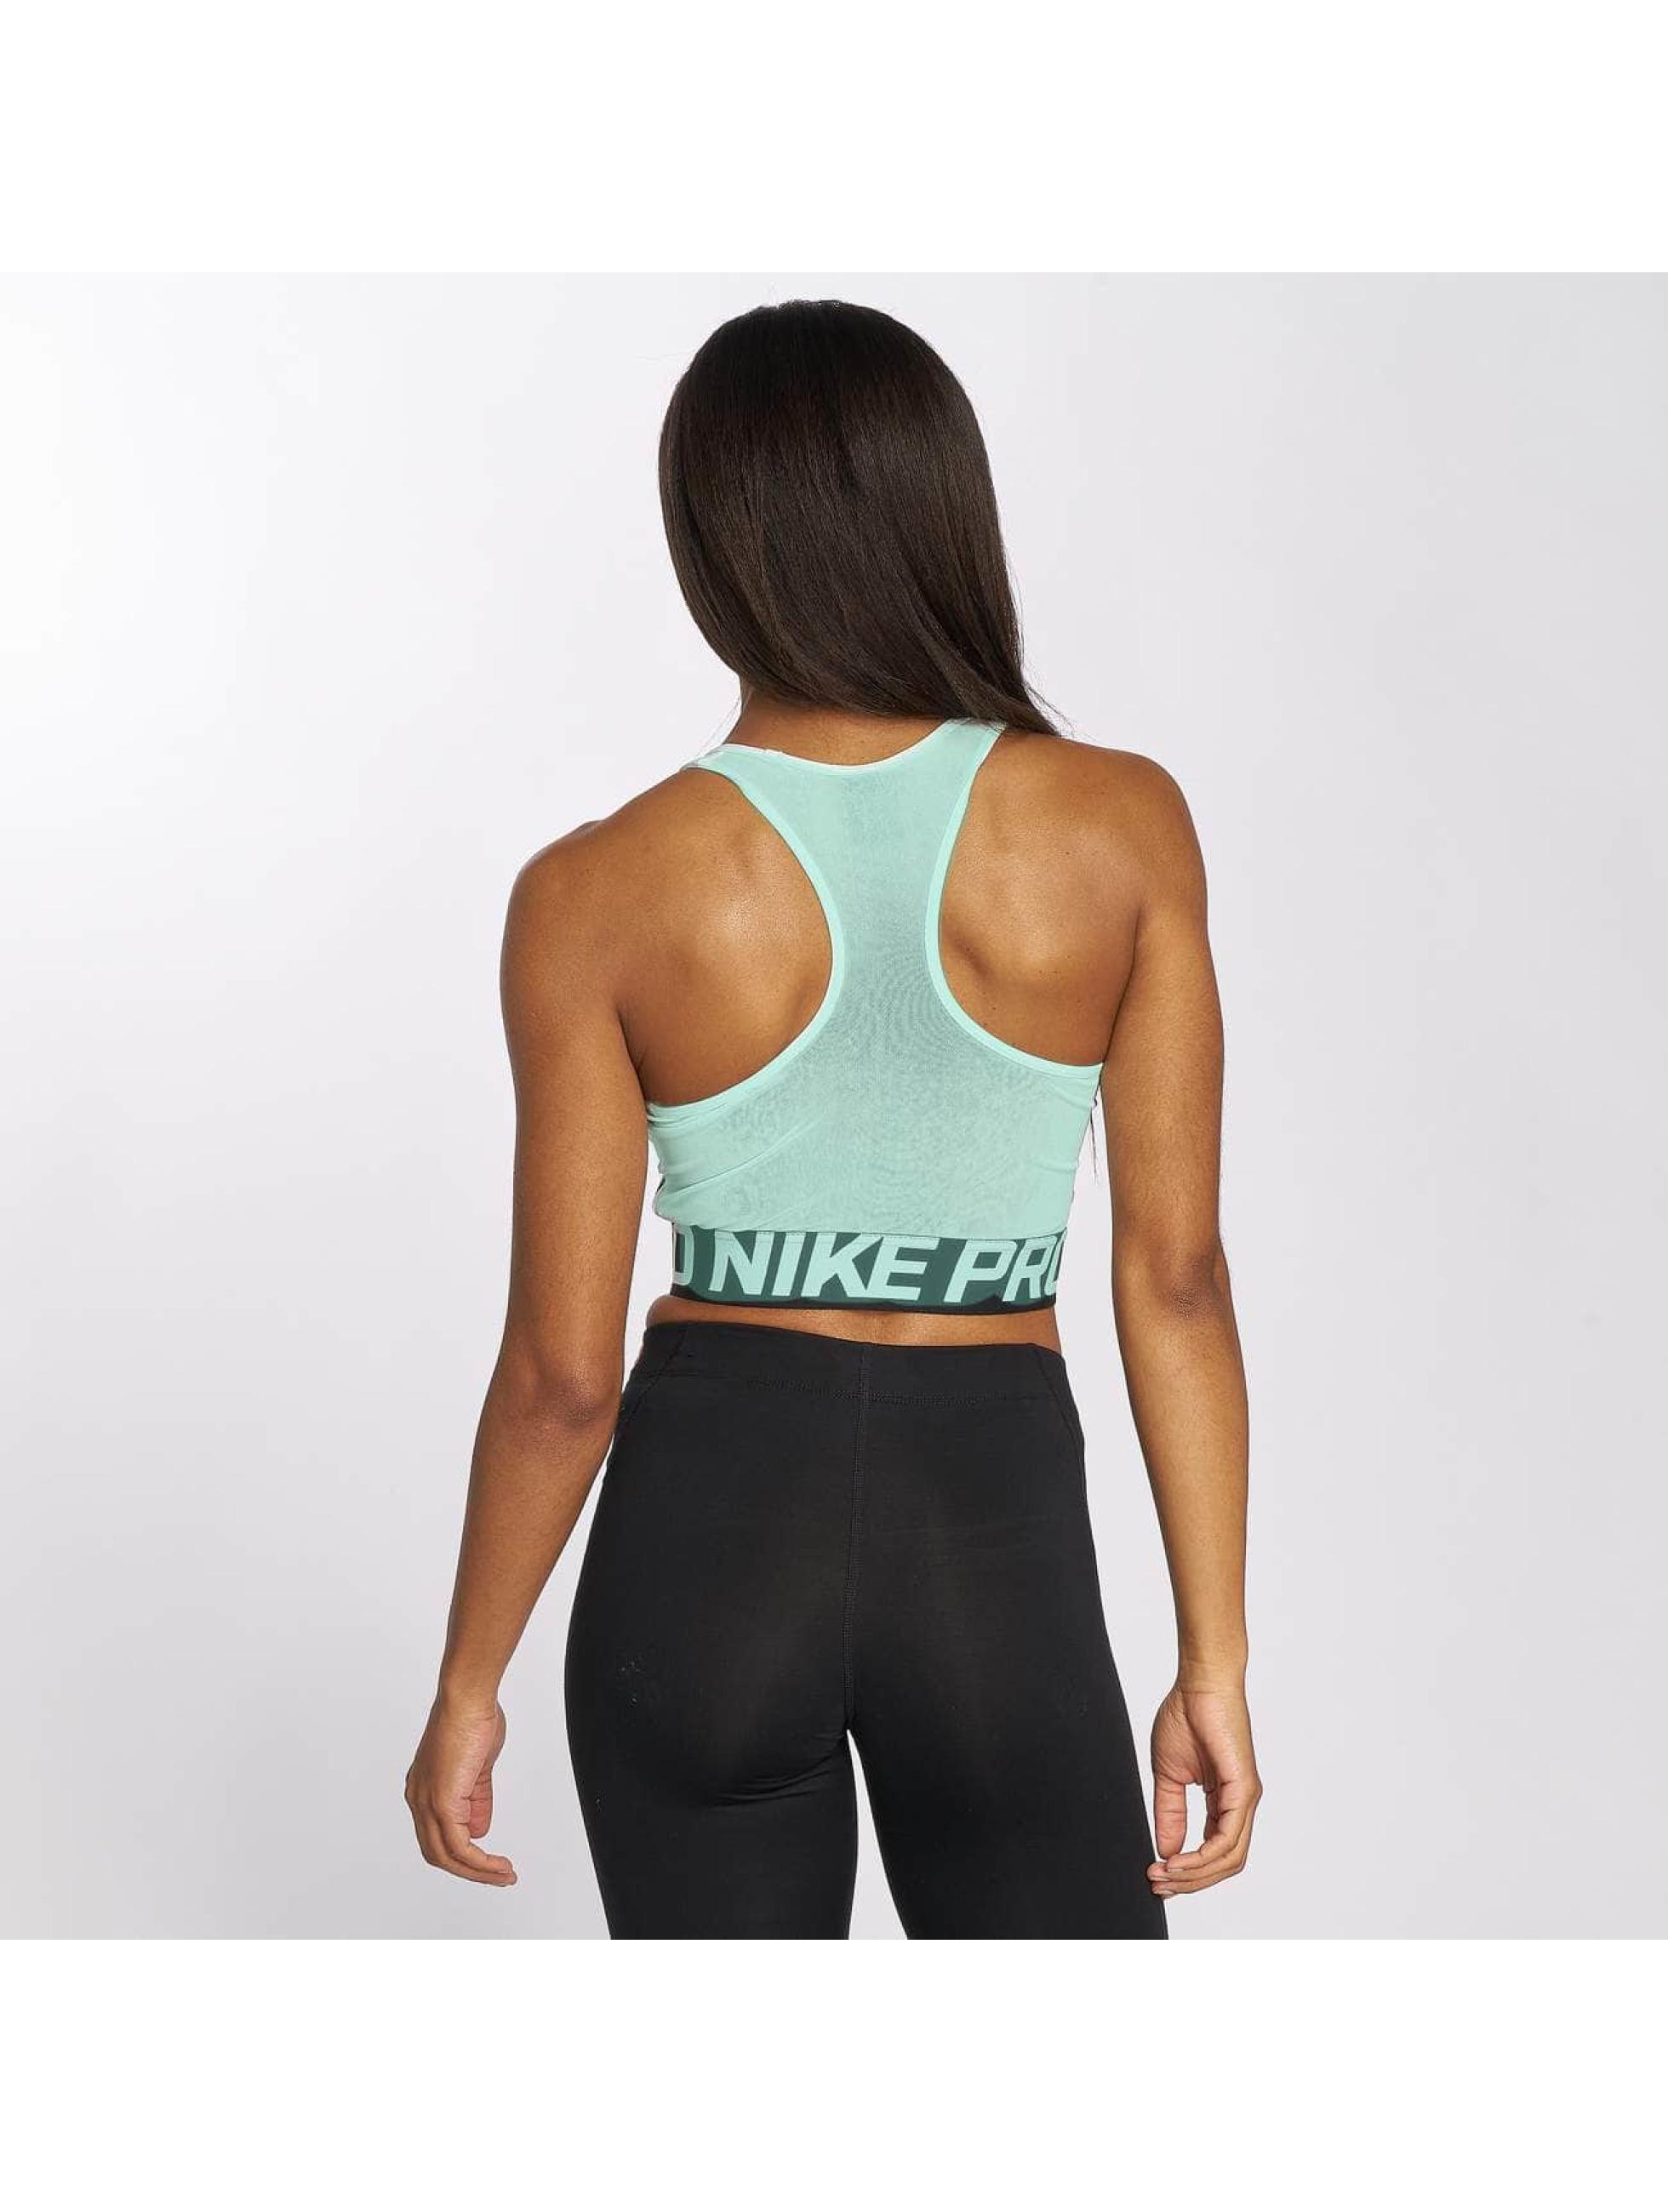 Nike Performance Top Pro green